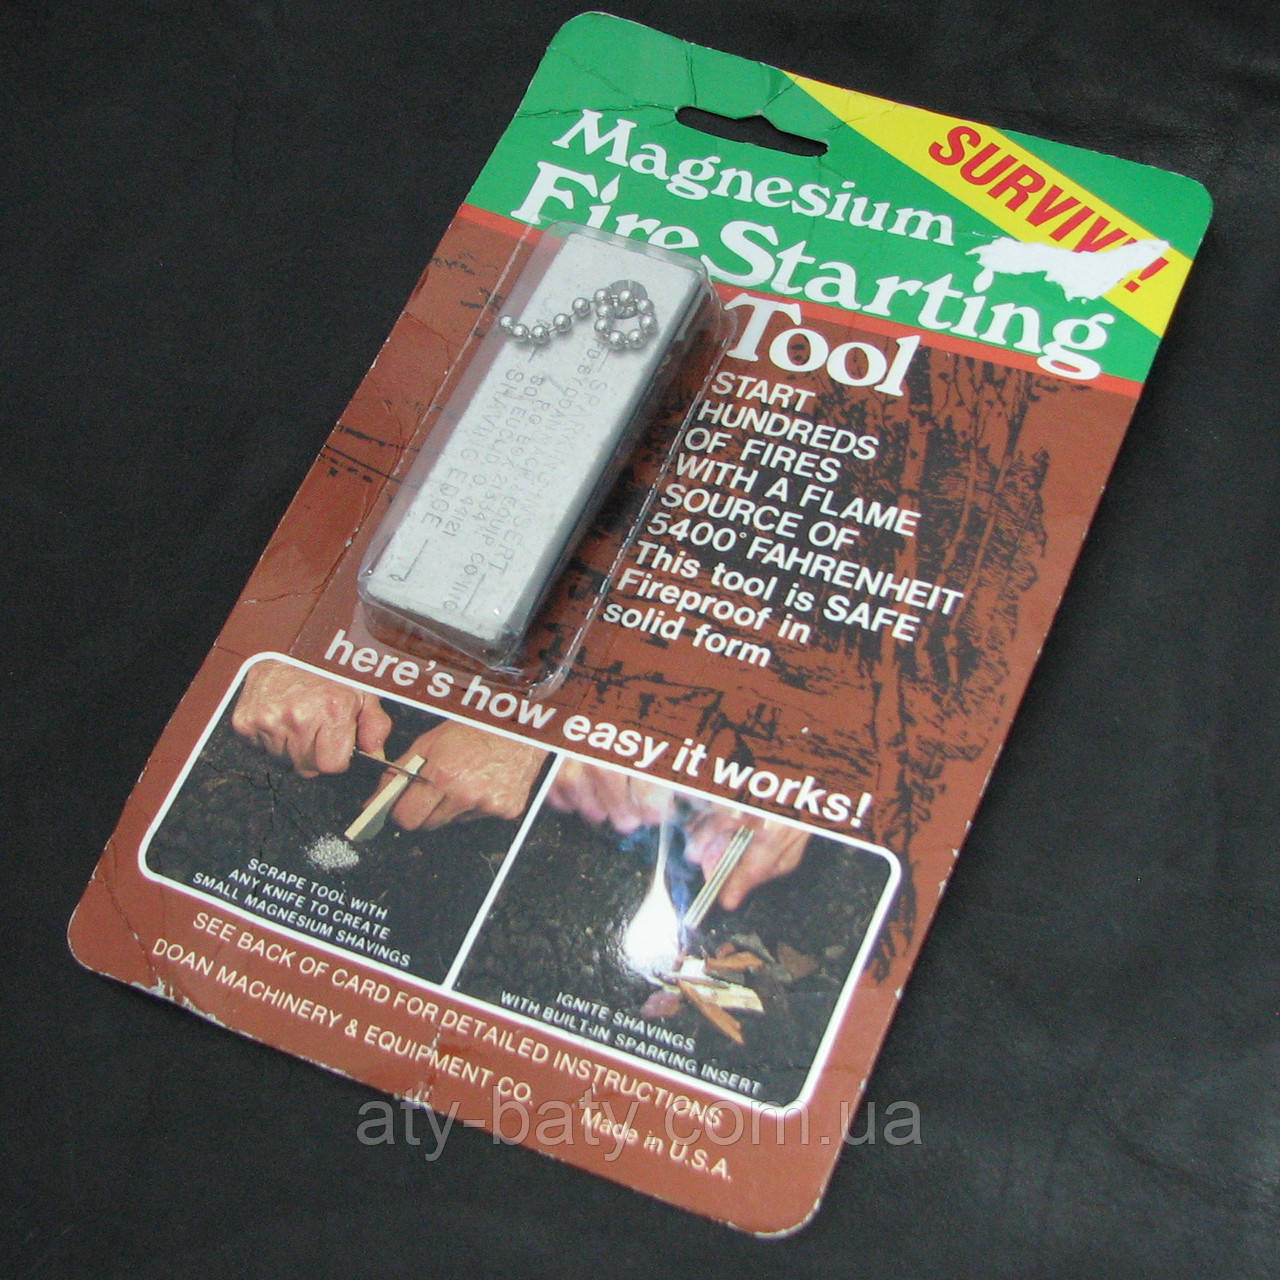 Магниевое огниво Doan Magnesium FireStarter (USA)